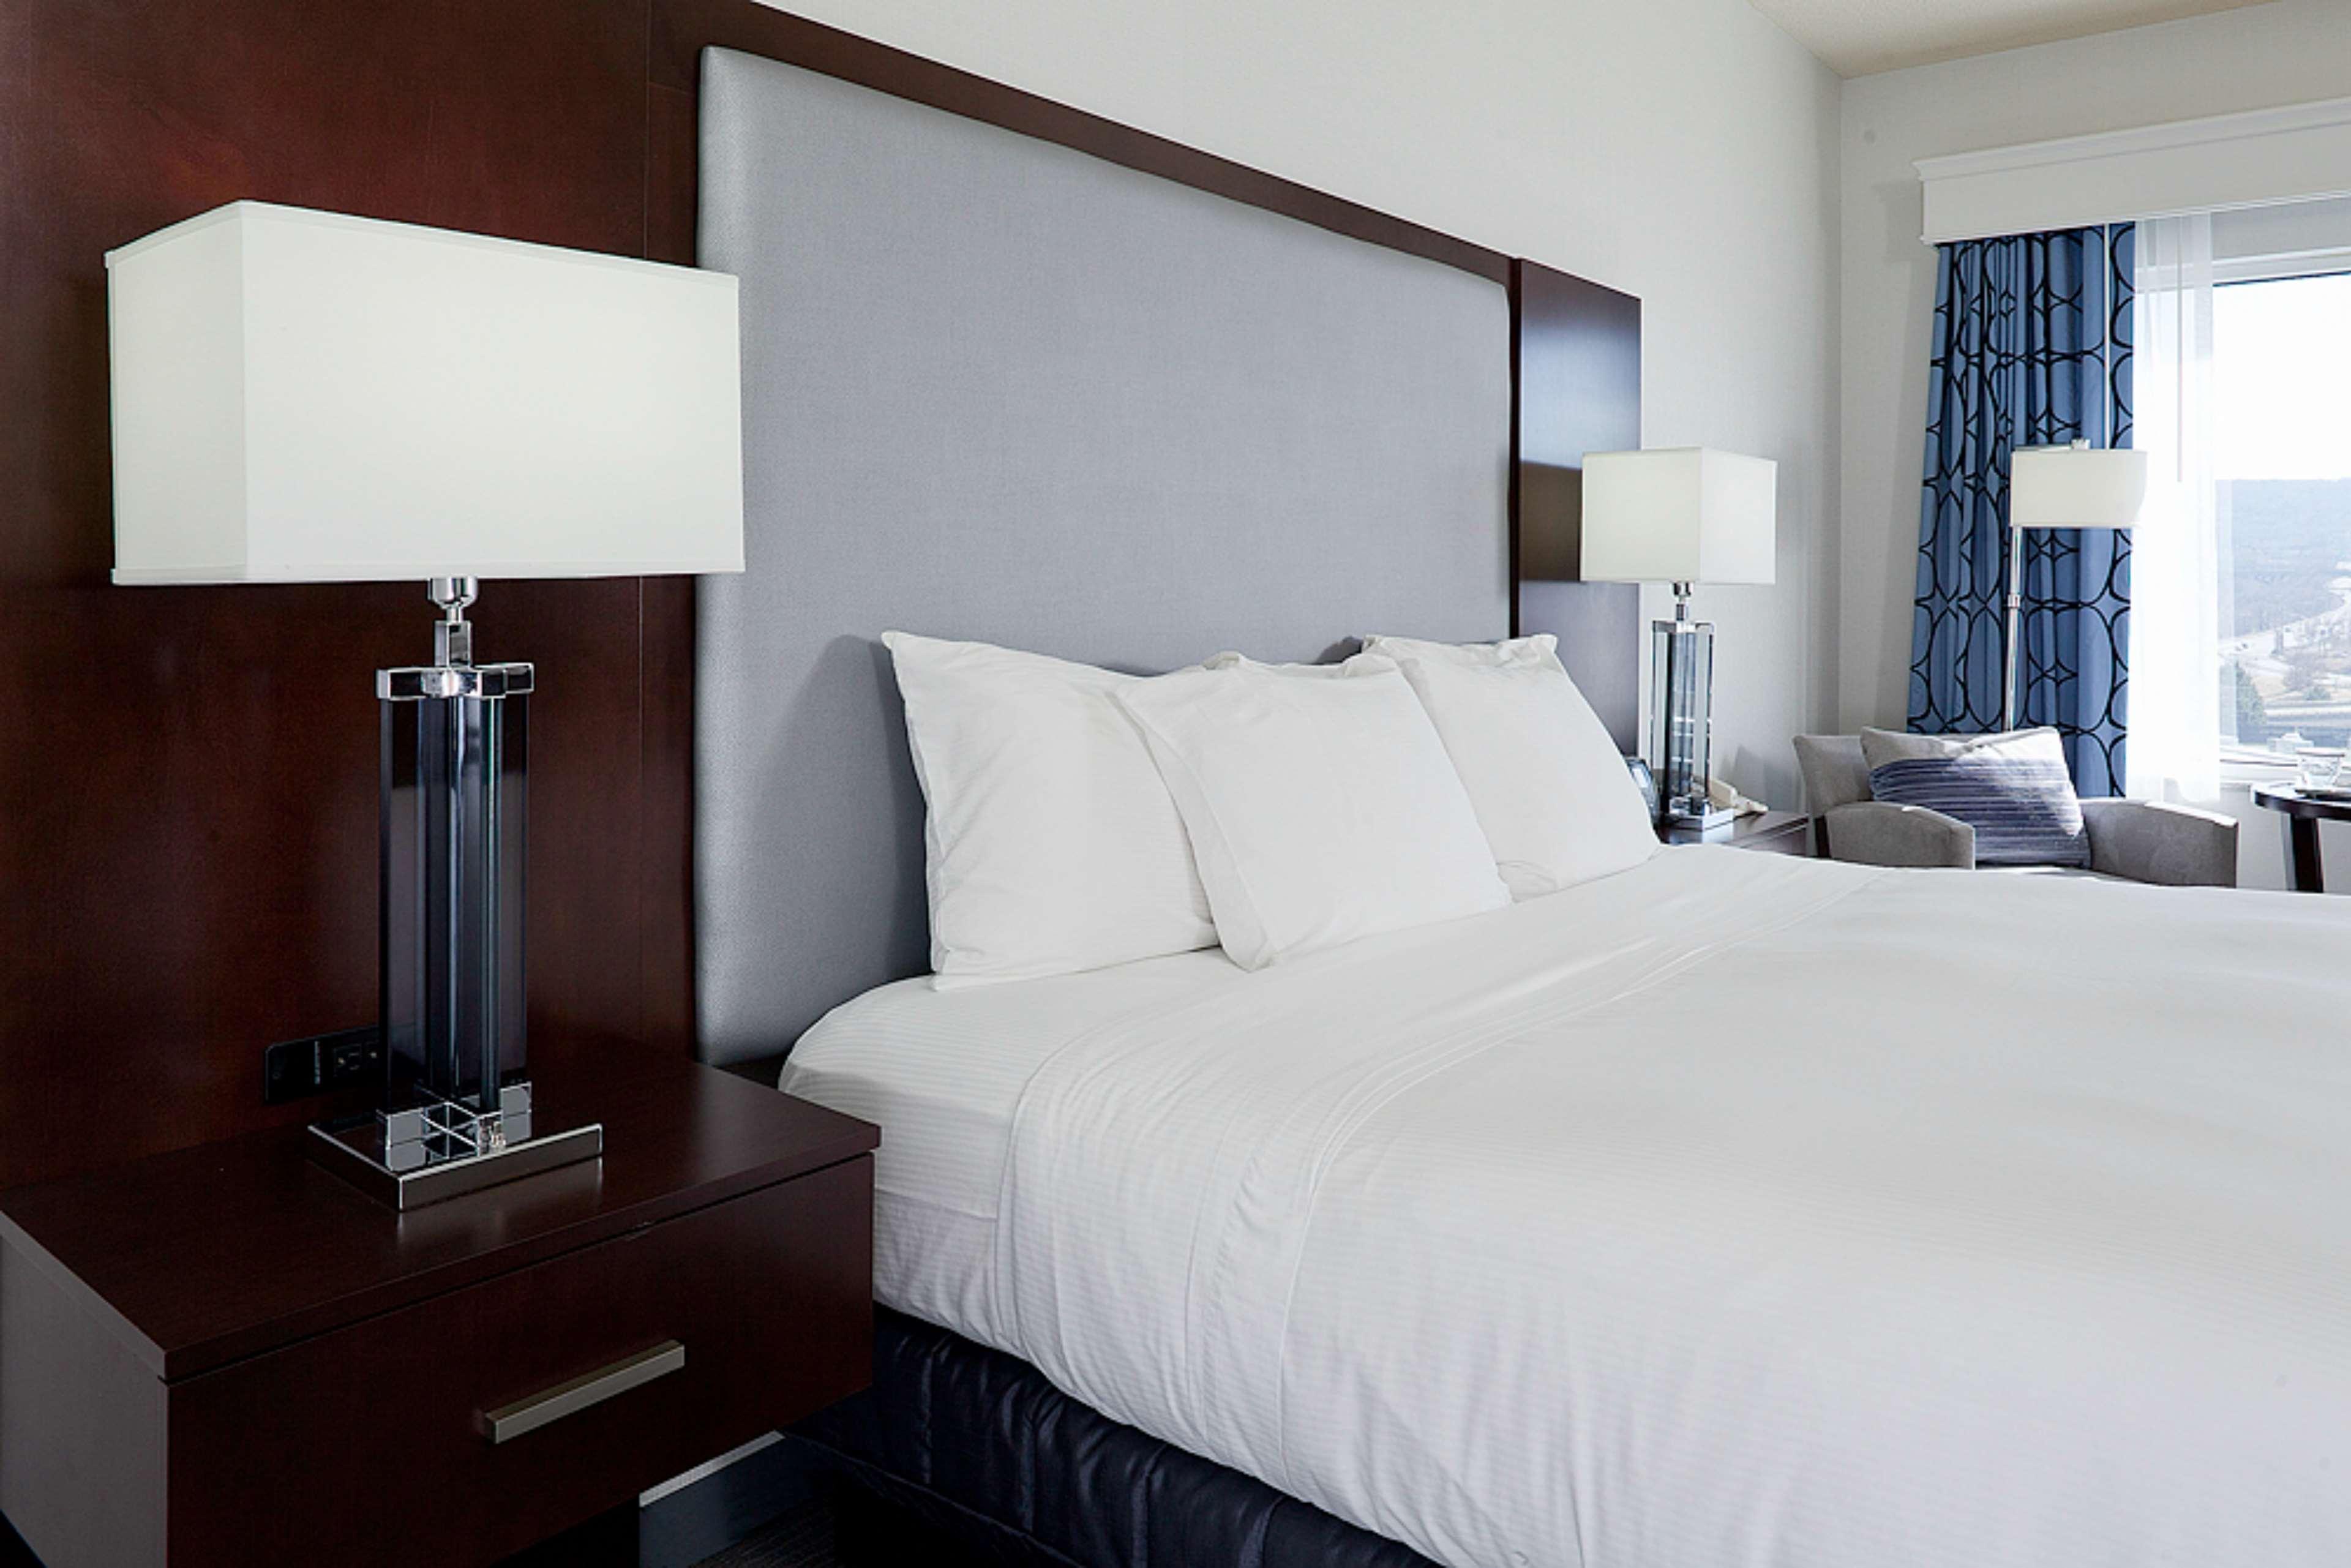 Hilton Scranton & Conference Center image 18